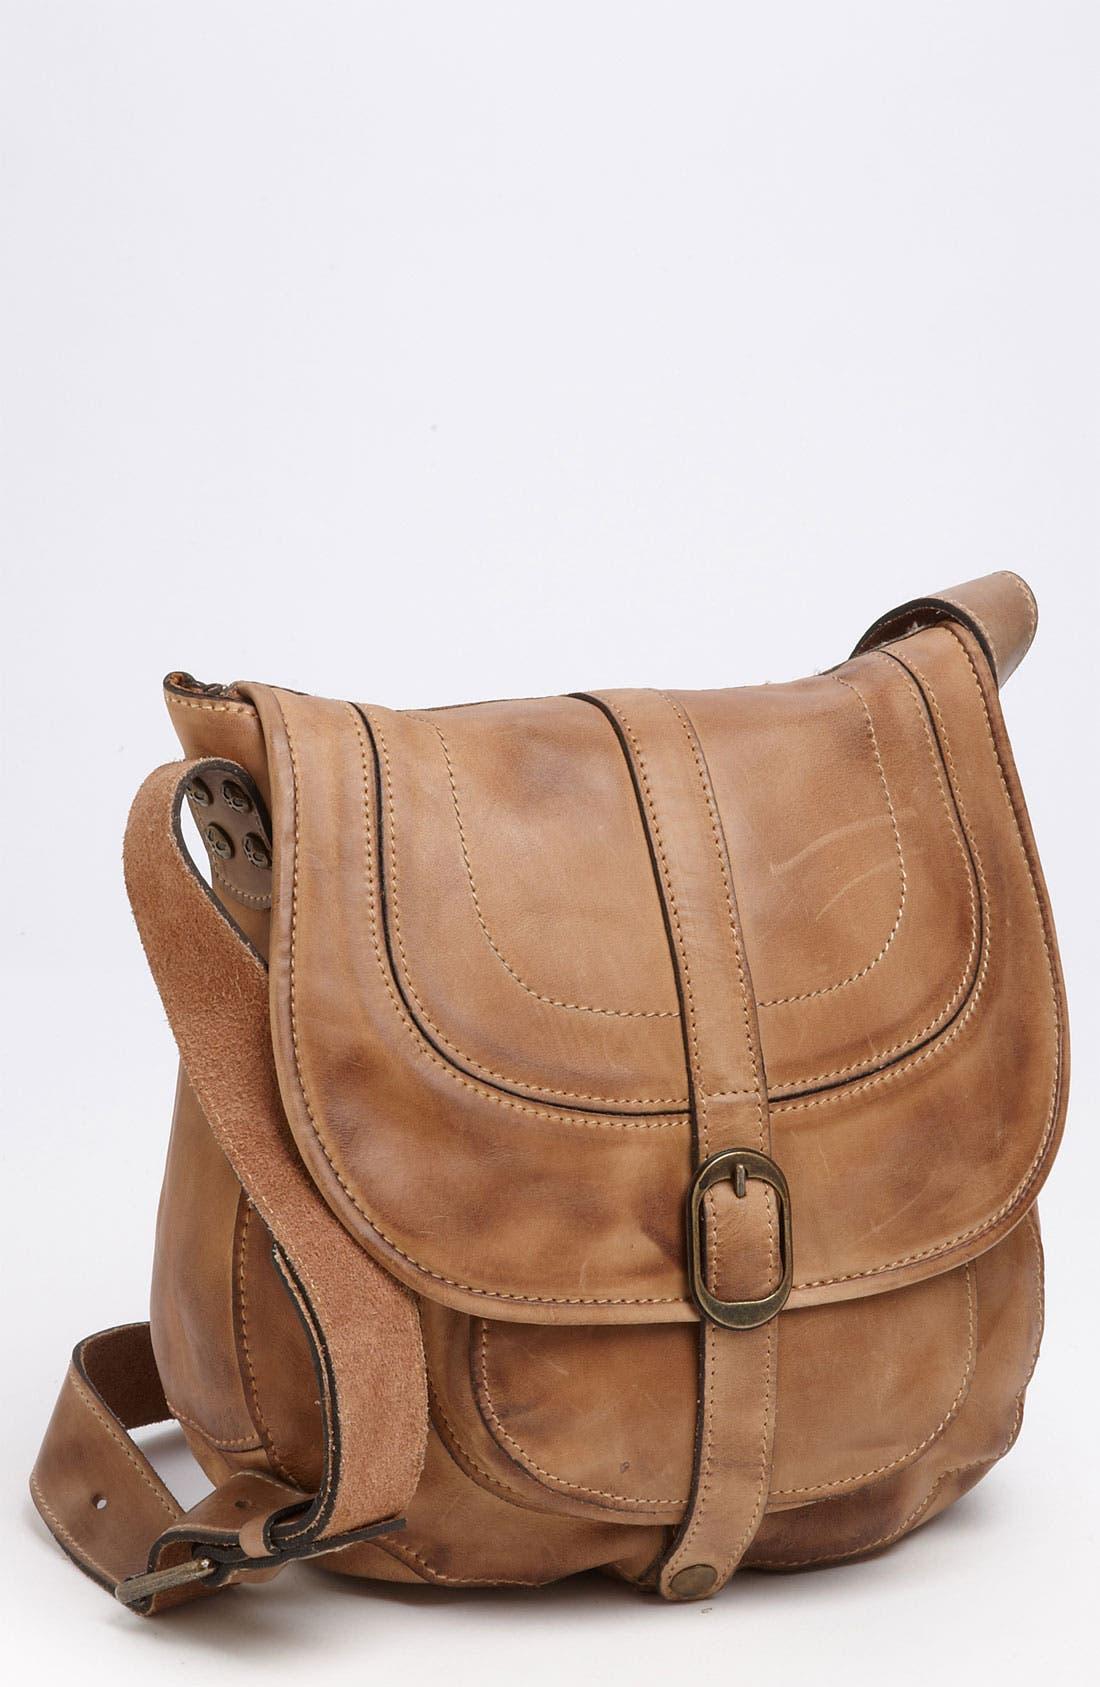 Main Image - Patricia Nash 'Barcelona' Saddle Bag